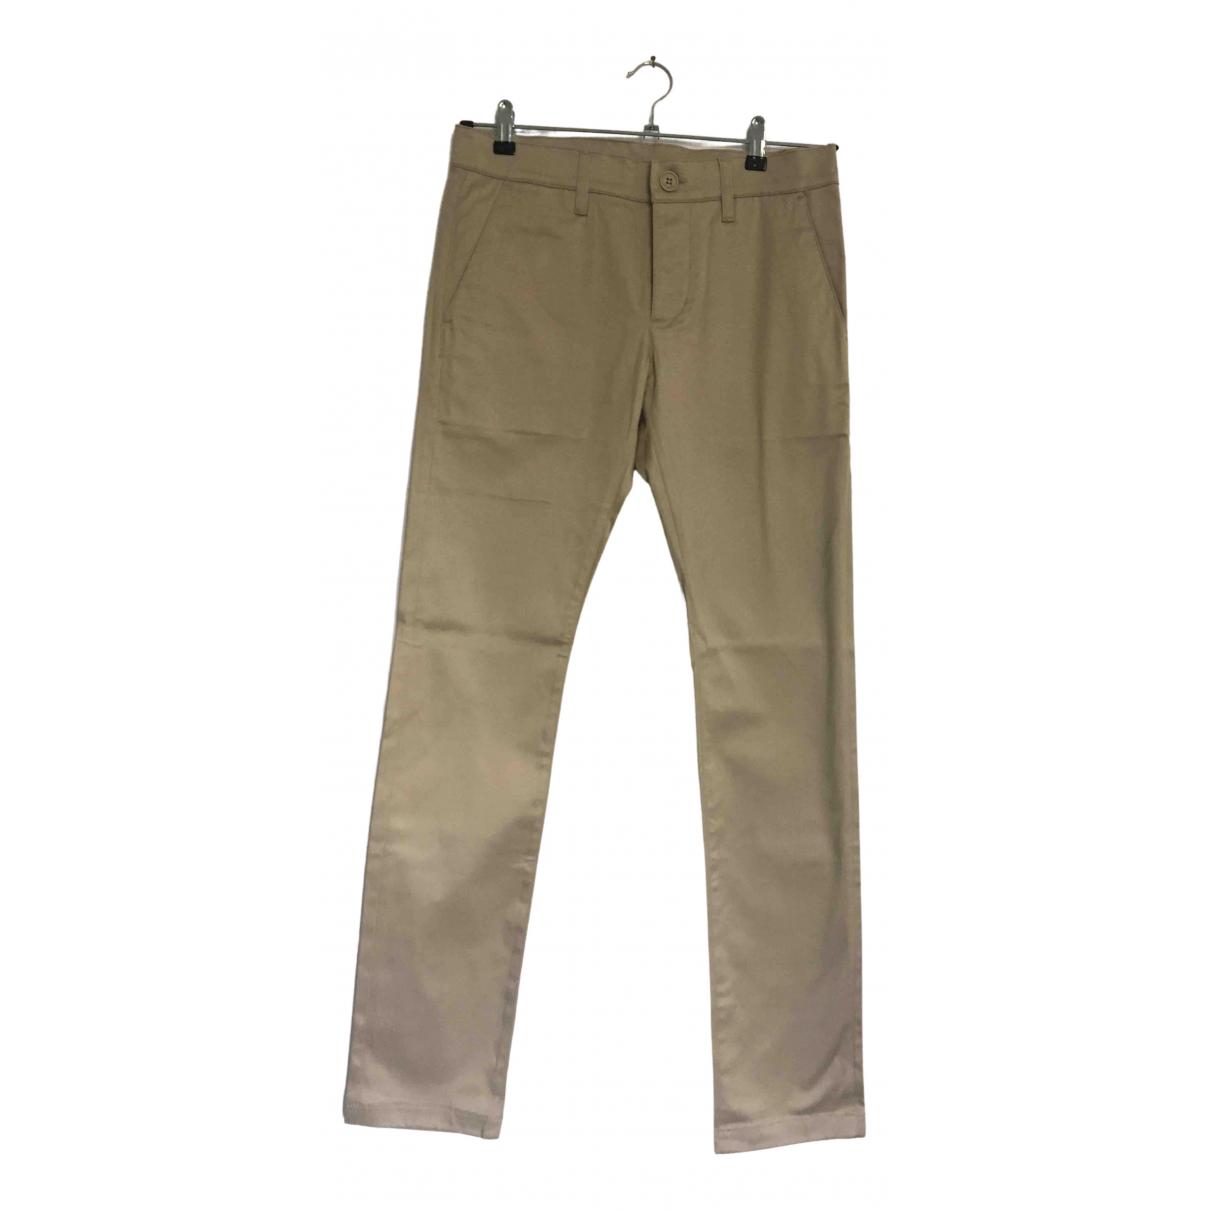 Pantalones en Algodon Beige Saint Laurent